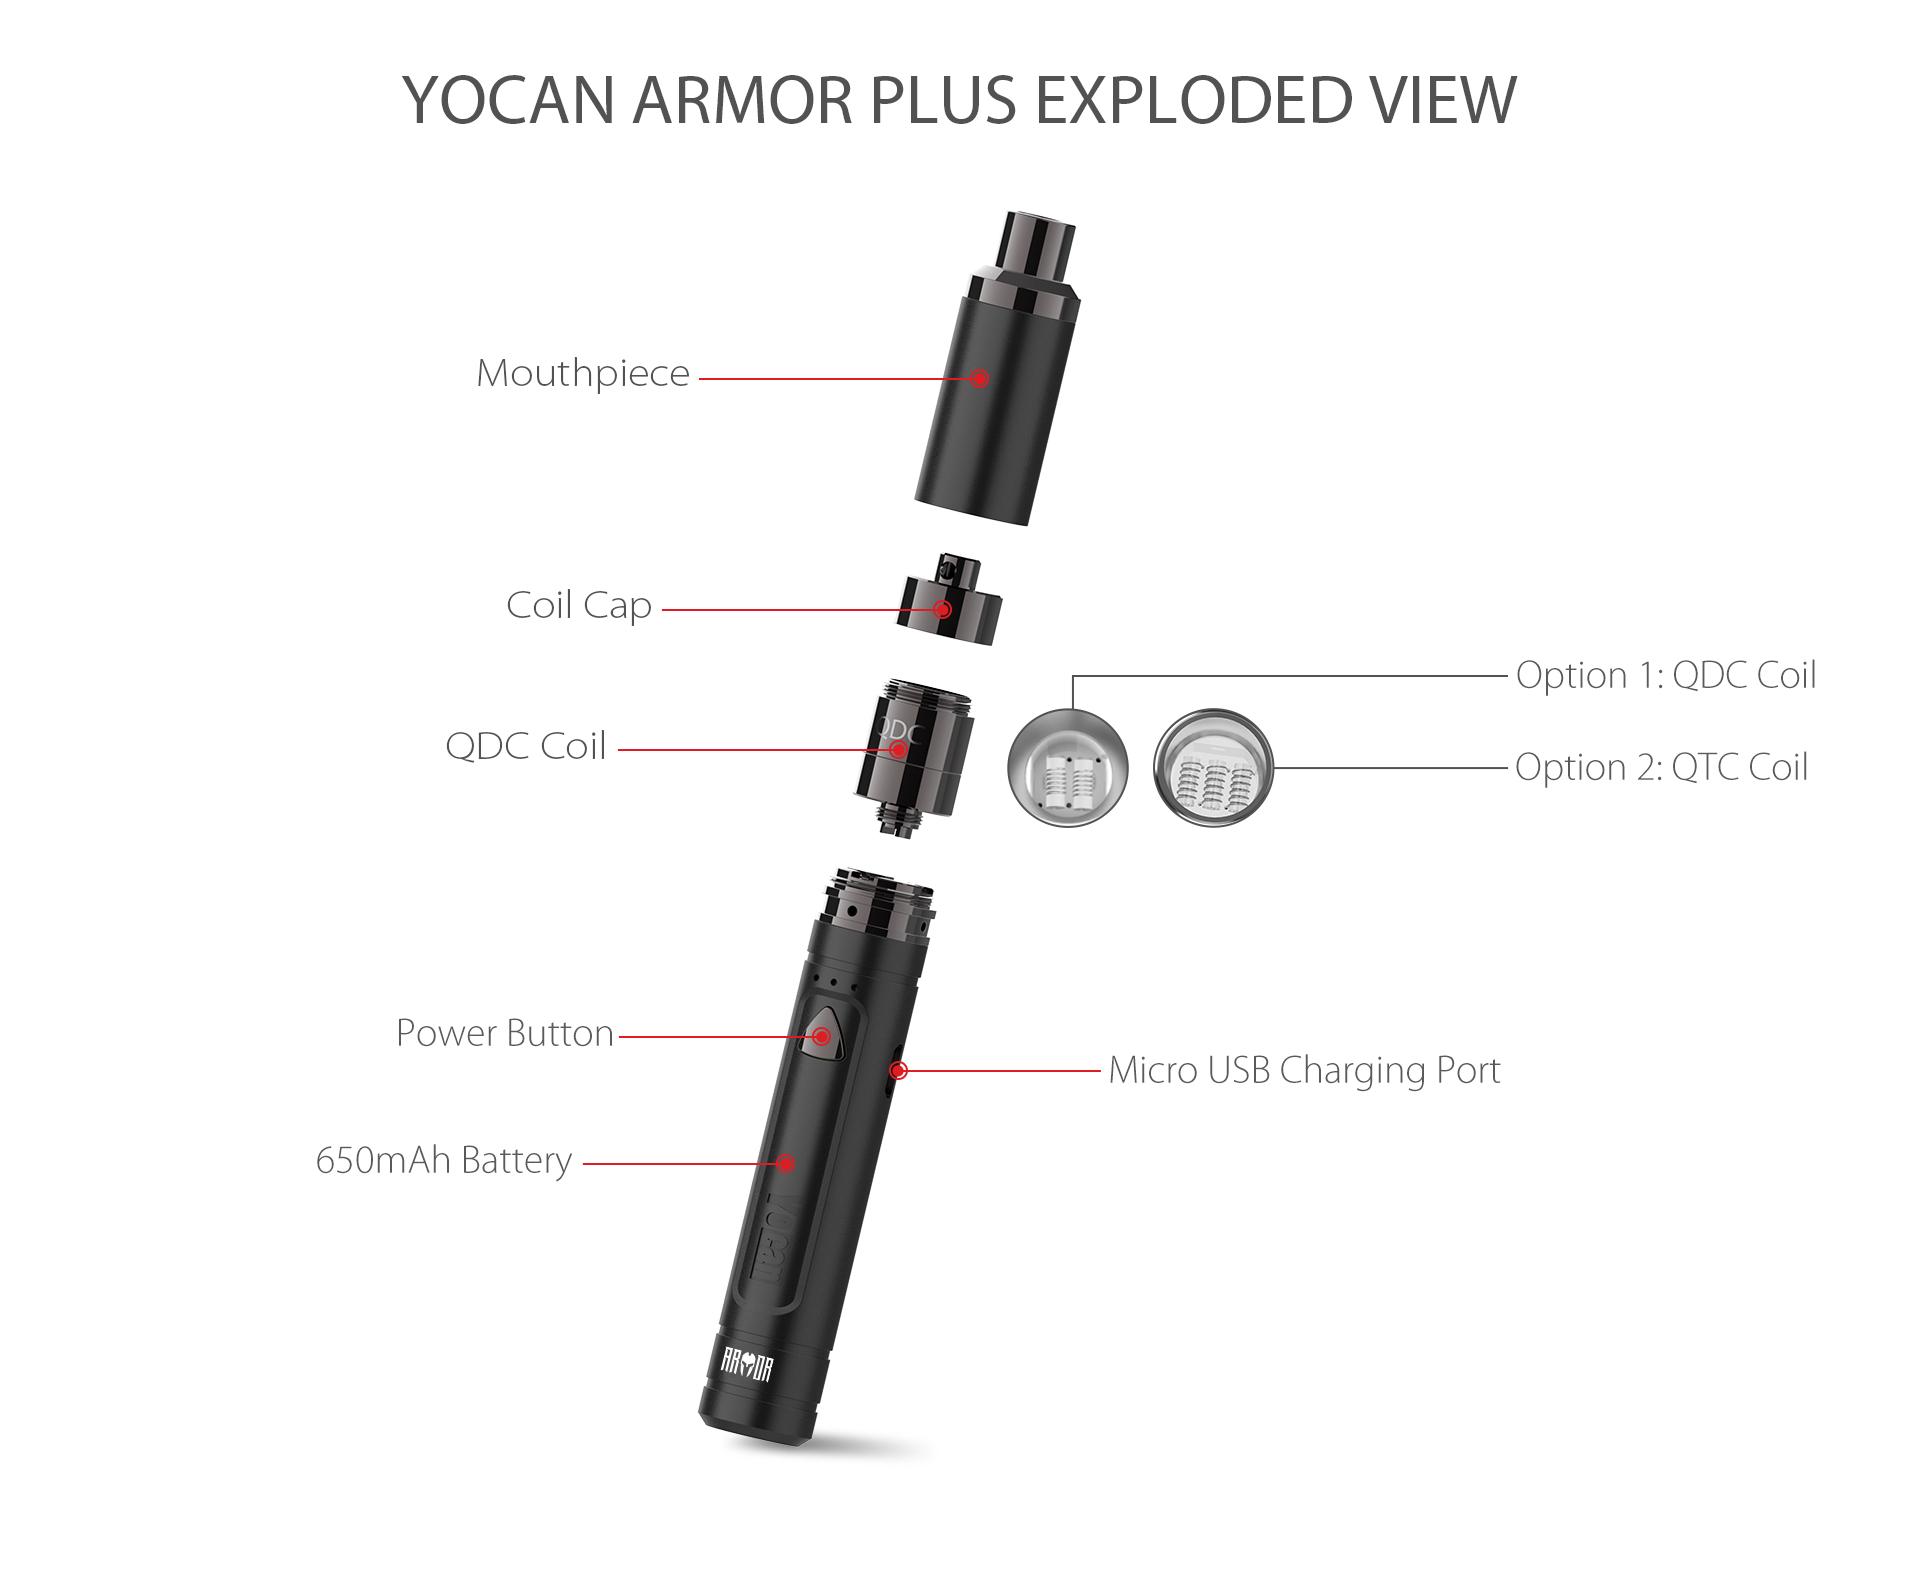 Yocan Armor Plus vape pen exploded view.